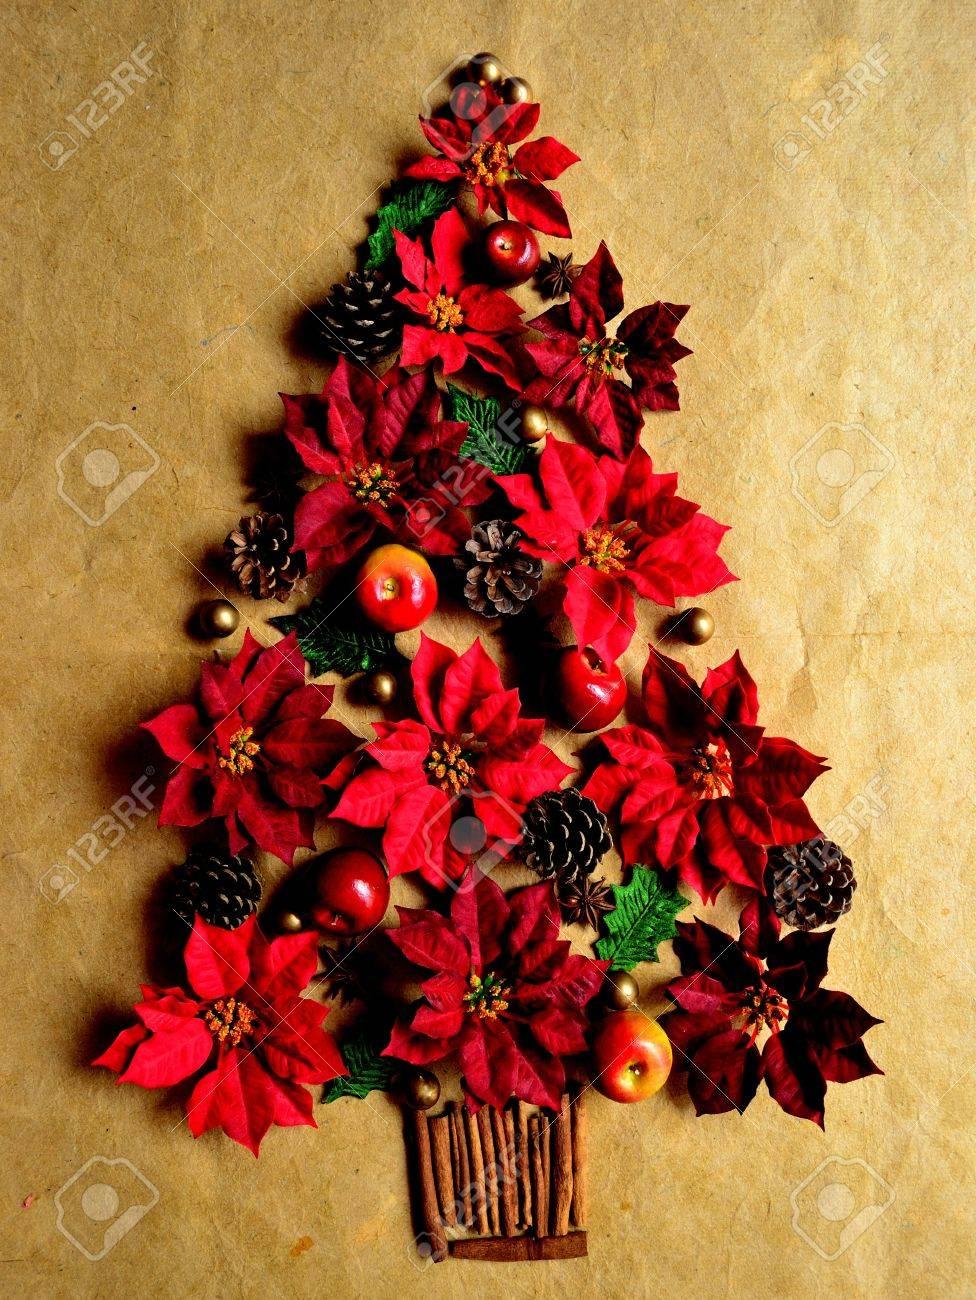 Pointsetta Christmas Tree.Red Poinsettia Christmas Tree